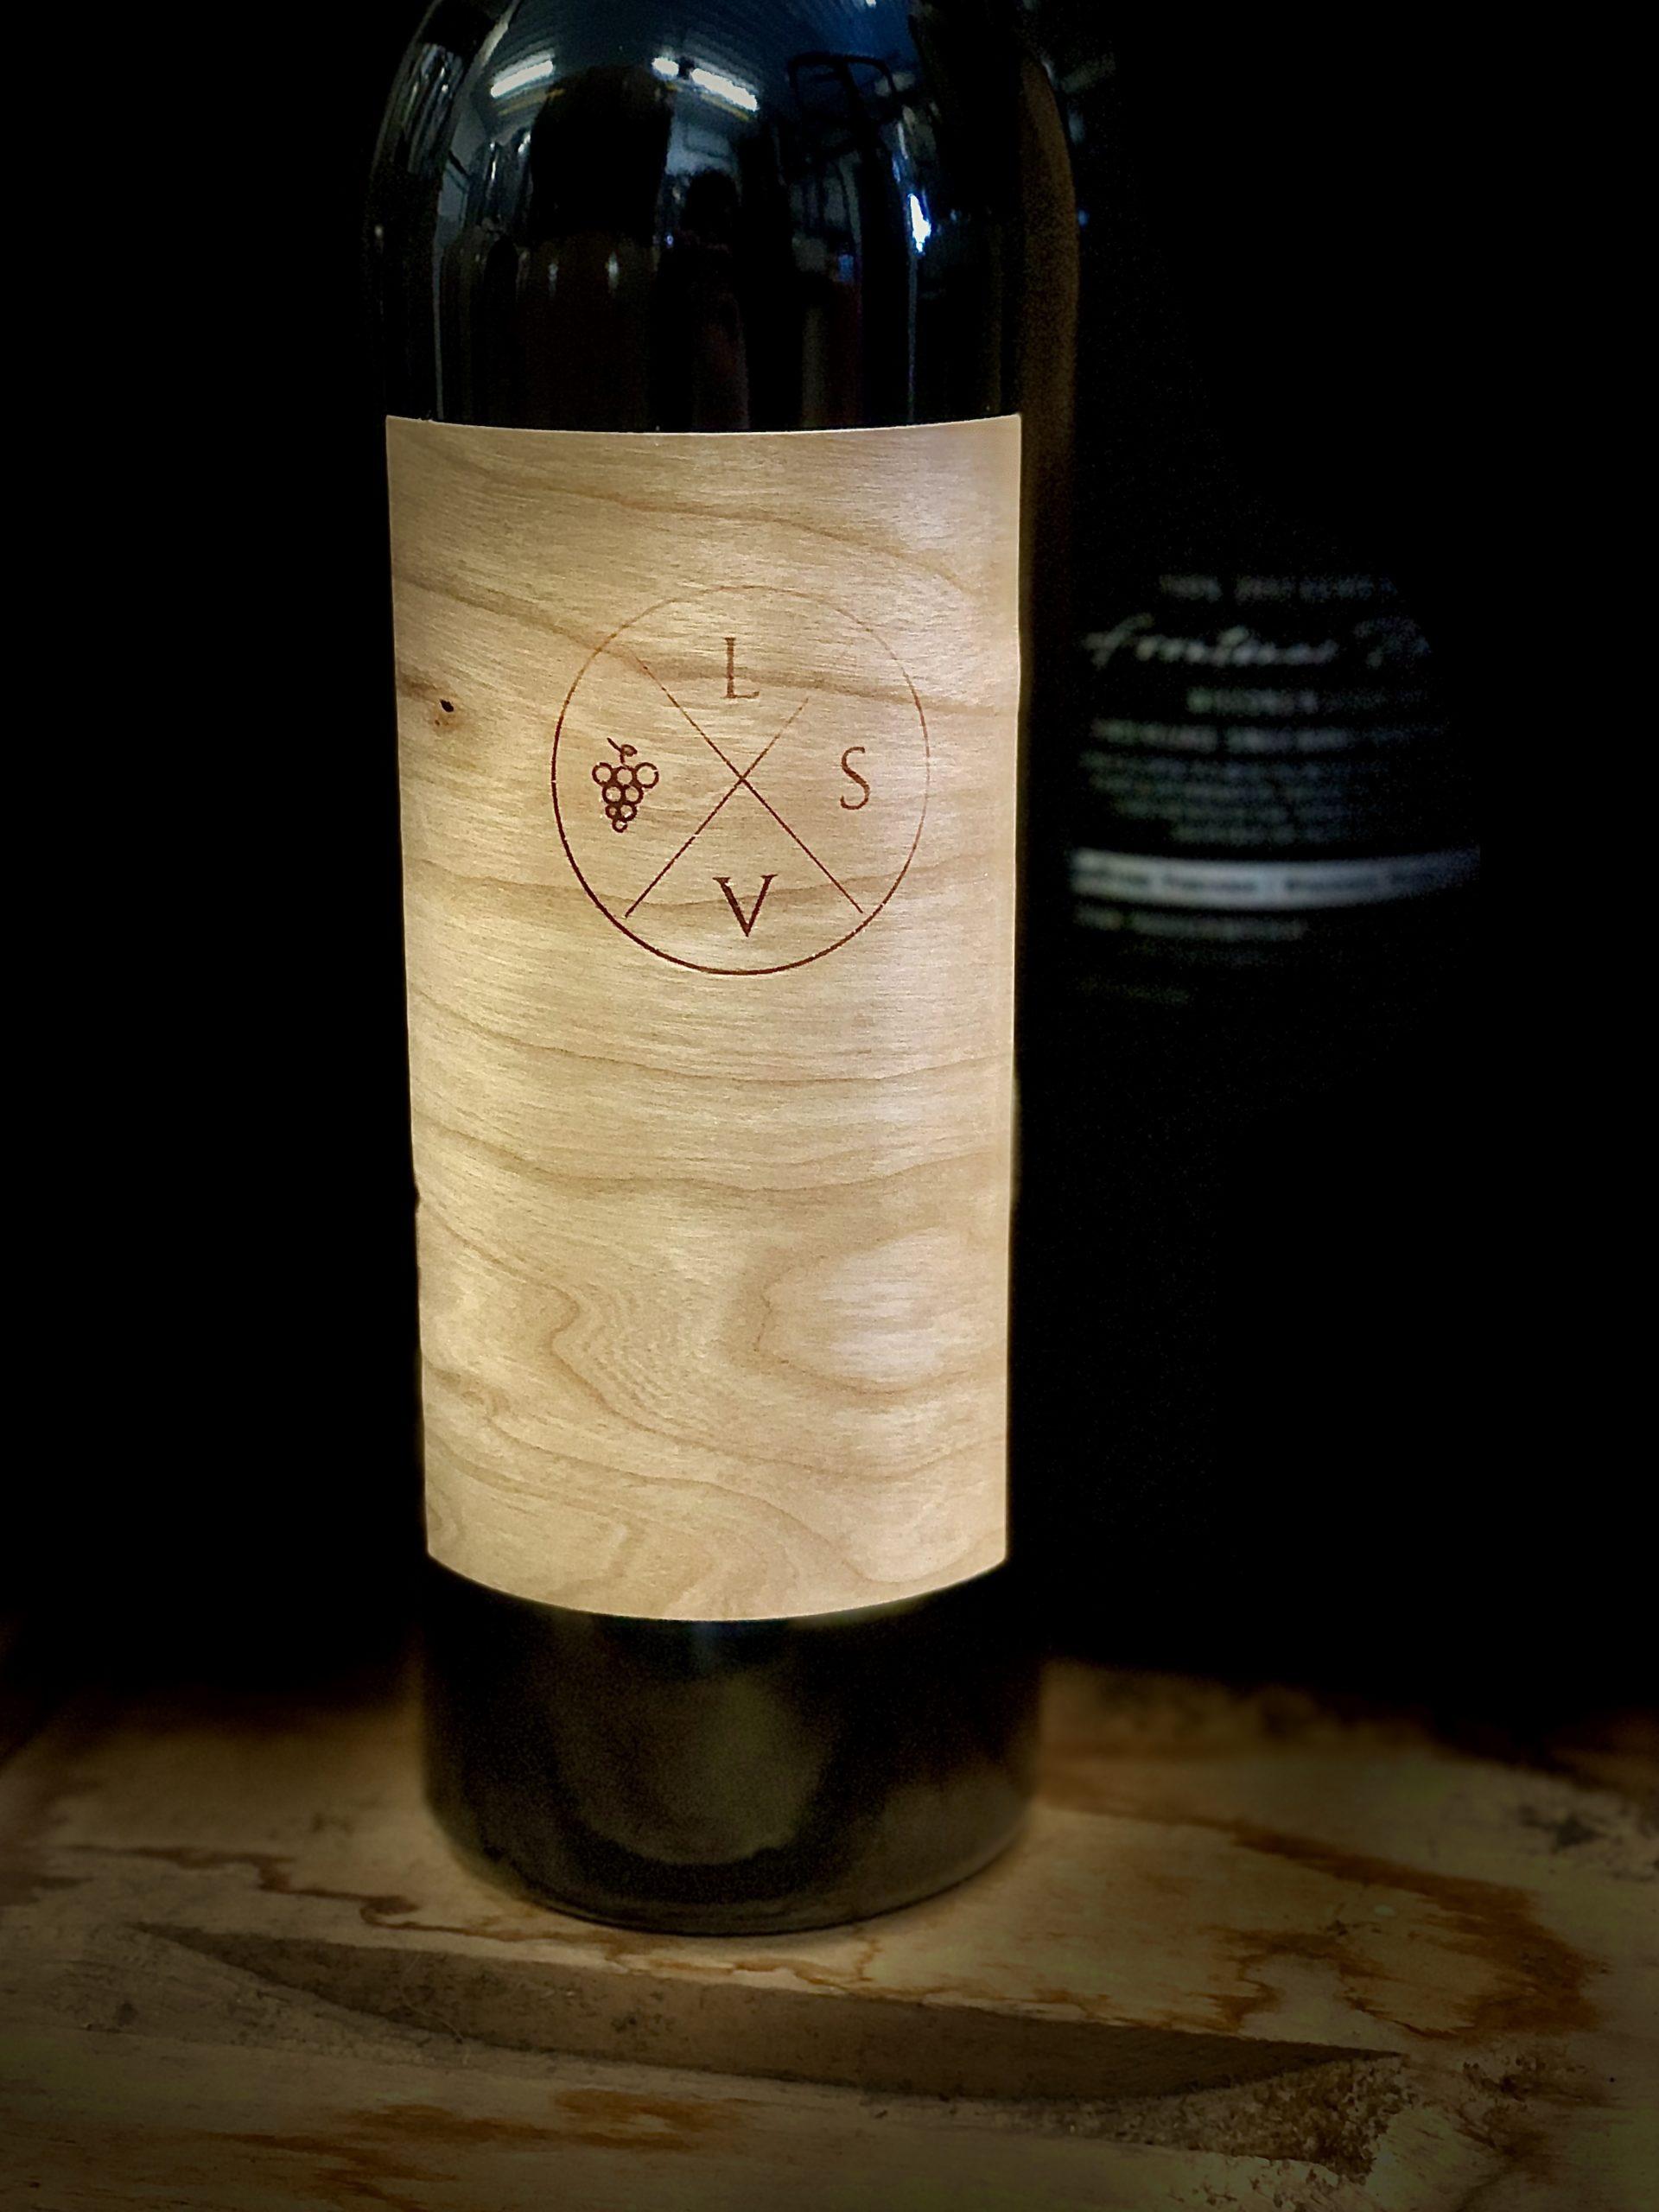 LedgeStone Vineyards